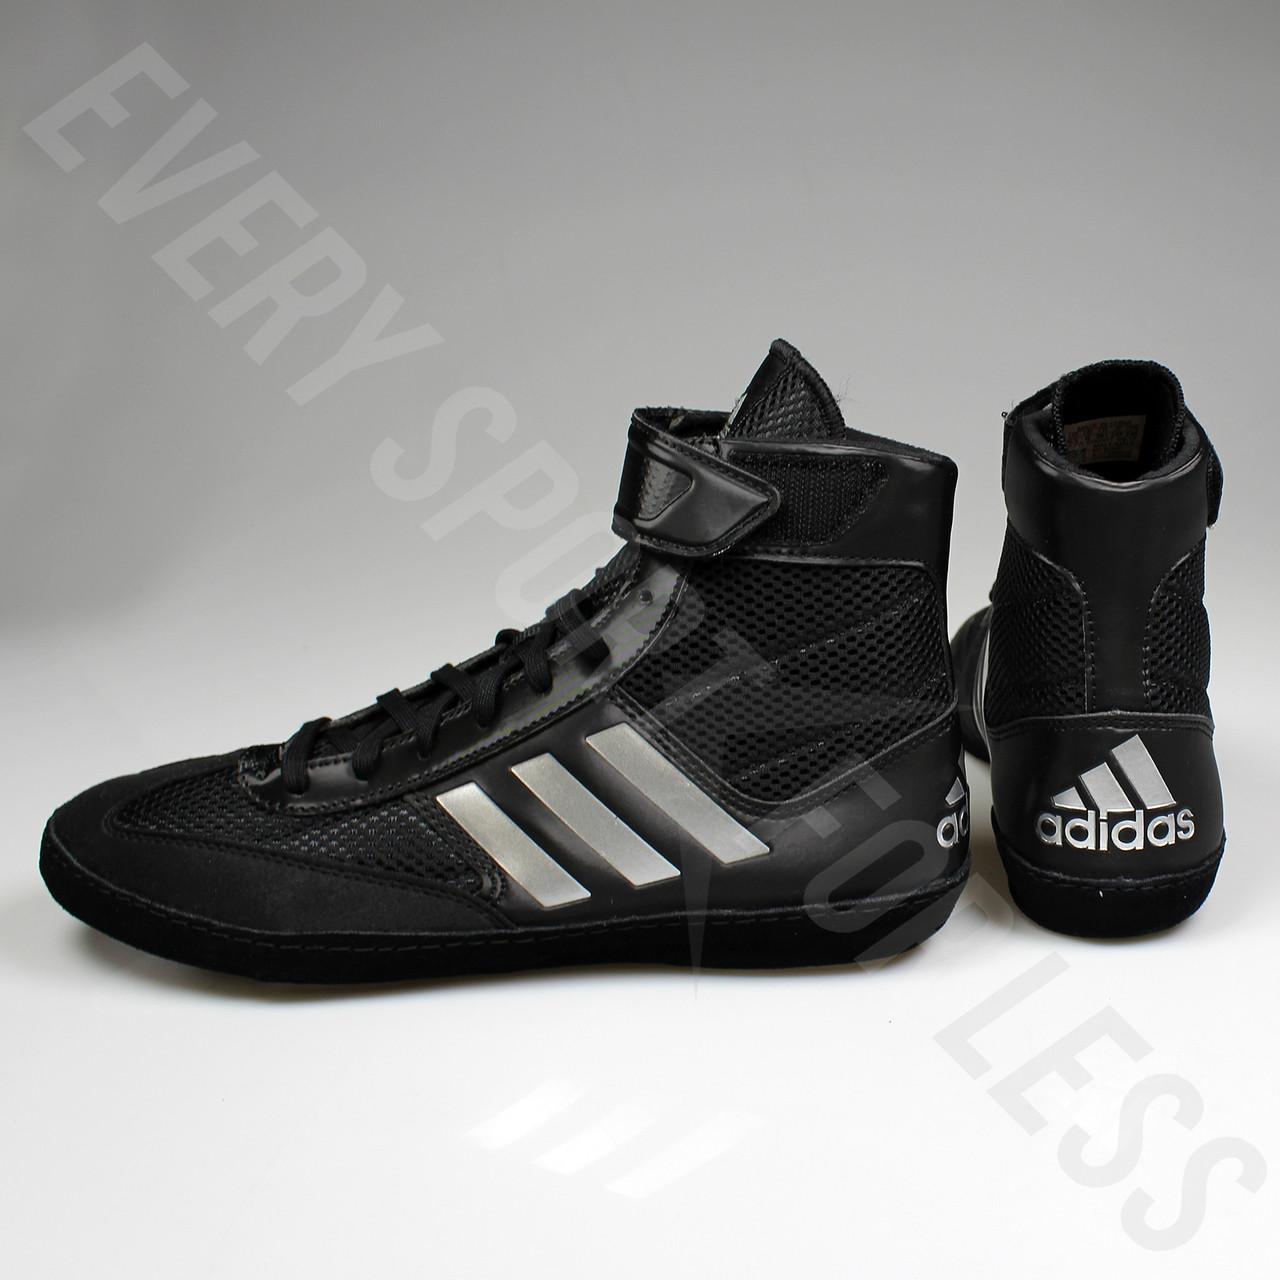 f030affd528 ... Adidas Combat Speed 5 Mens Wrestling Shoes BA8007 - Black   Silver